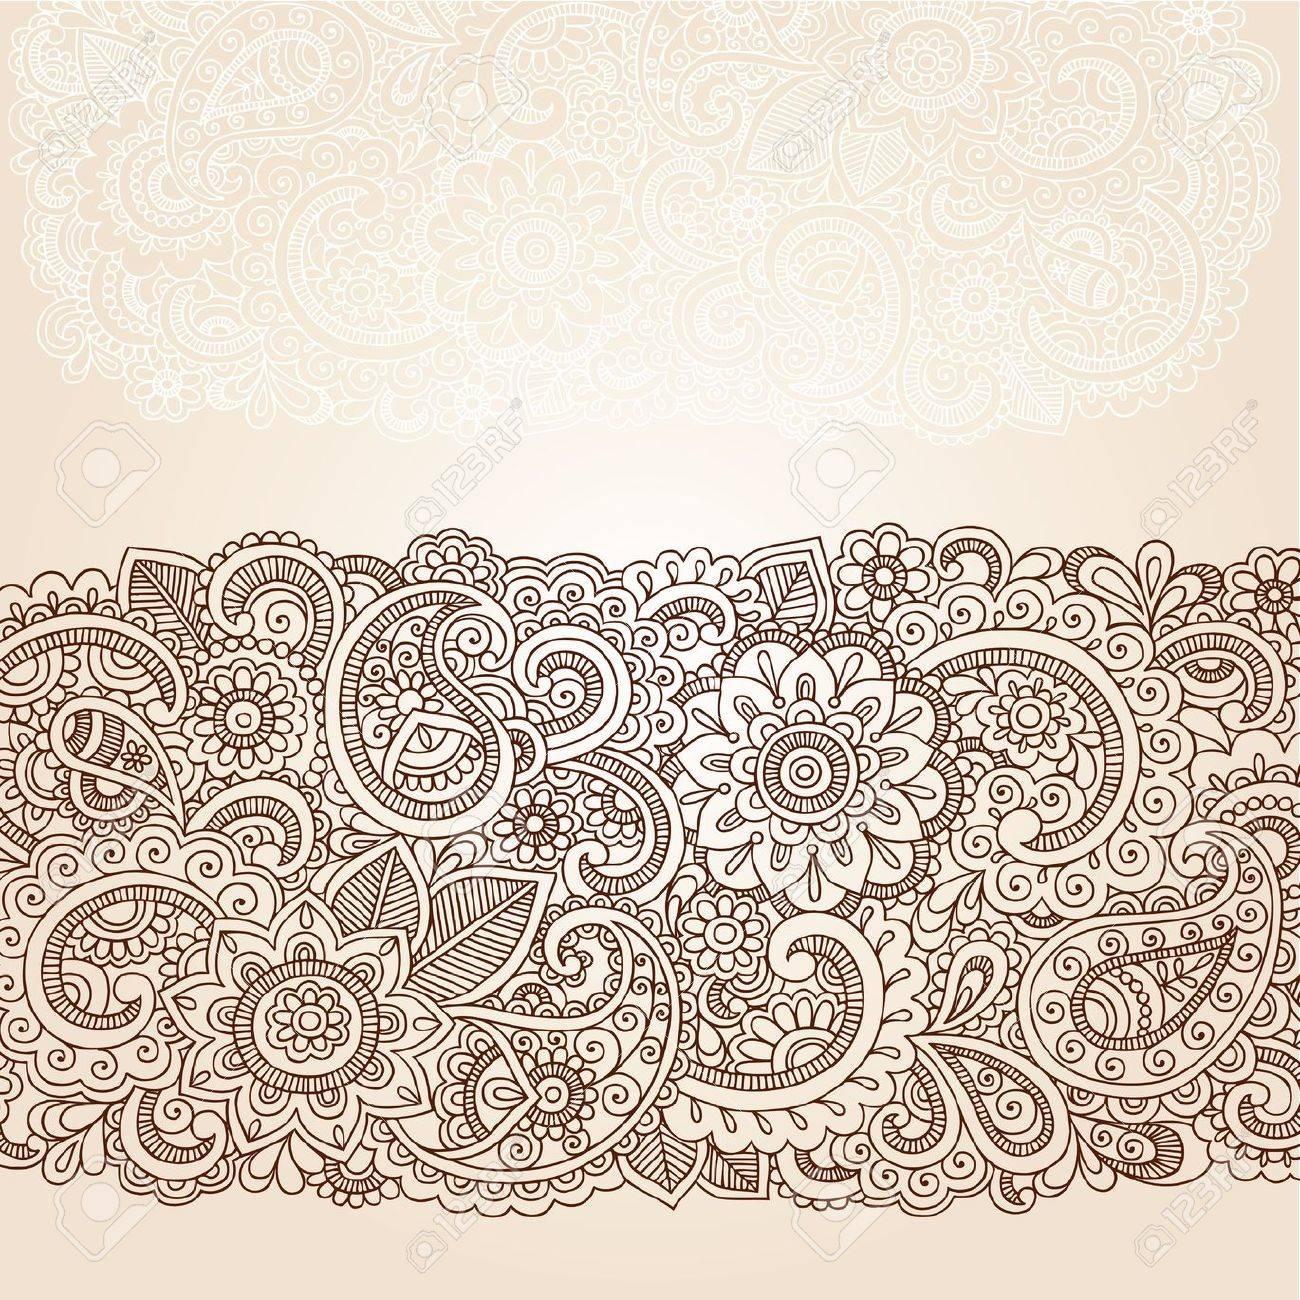 Henna Flowers and Paisley Mehndi Tattoo Edge Design Doodle Stock Vector - 16693321